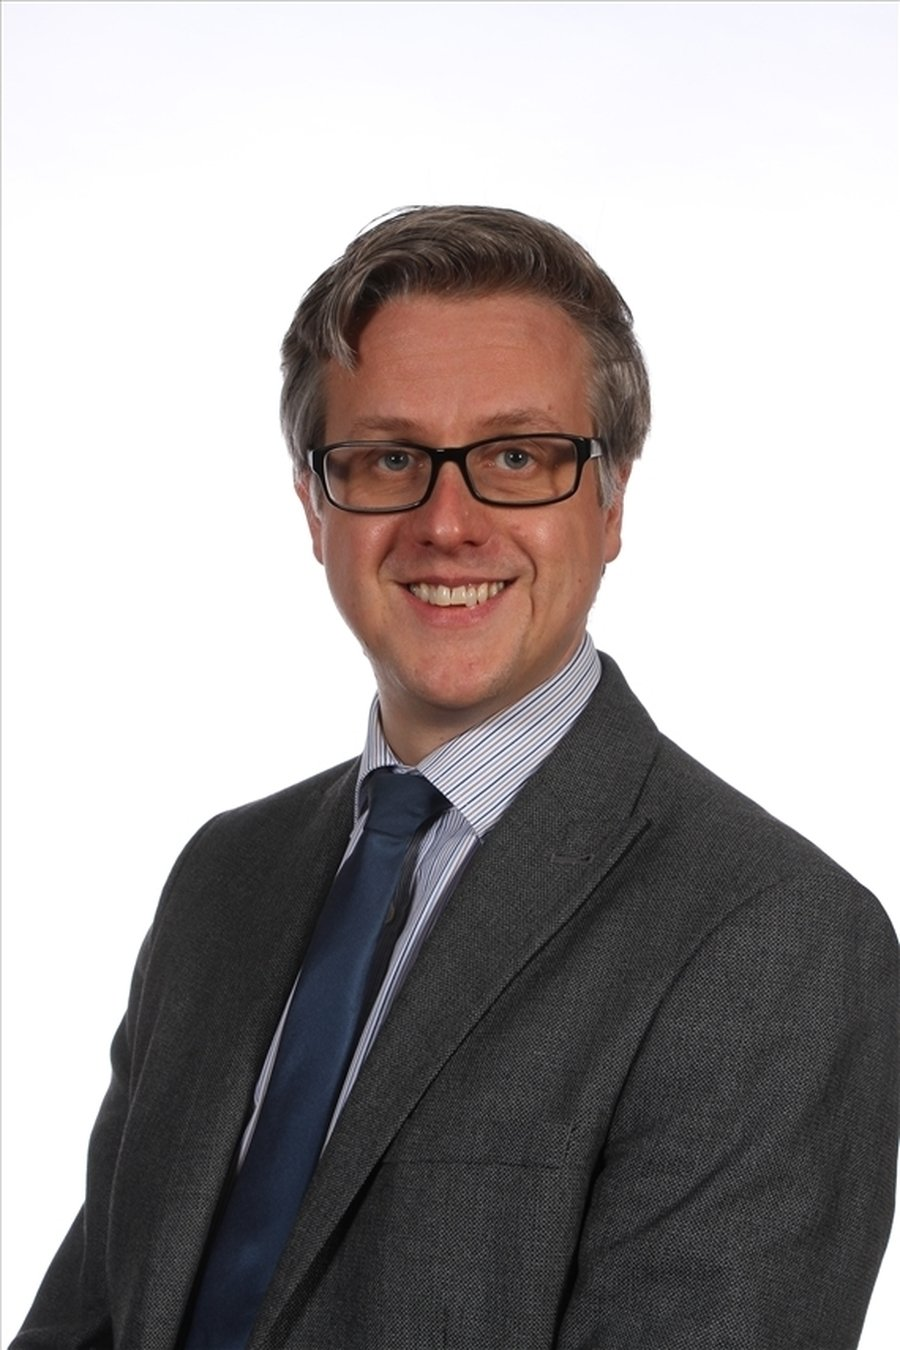 Mr Broadbent, Deputy Head, Child Protection, Year 5/6 Class Teacher, English Lead, Assessment, Pupil Premium